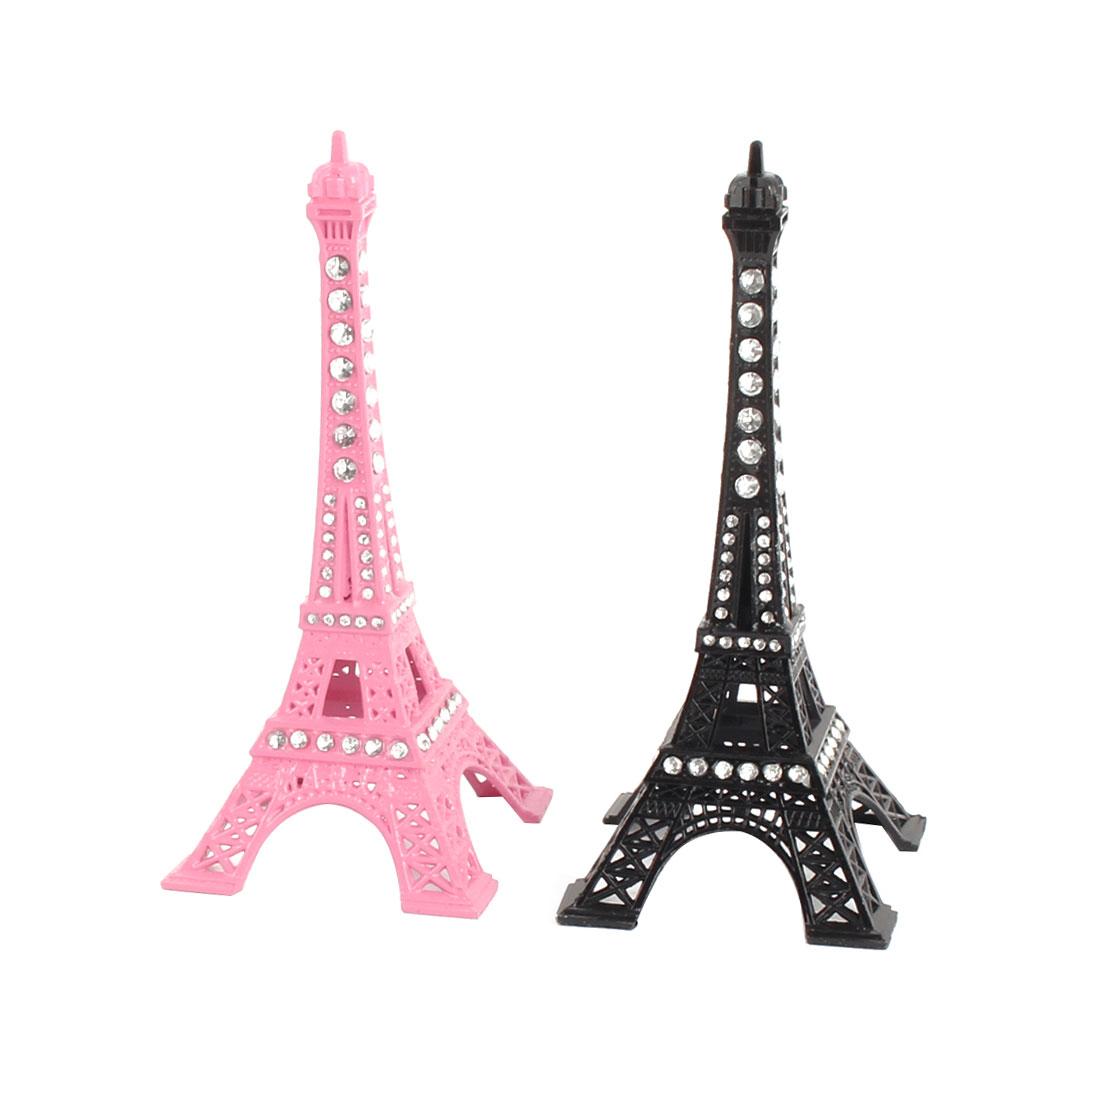 Room Bedroom Metal Miniature Statue Eiffel Tower Model Souvenir Pink Black 2pcs